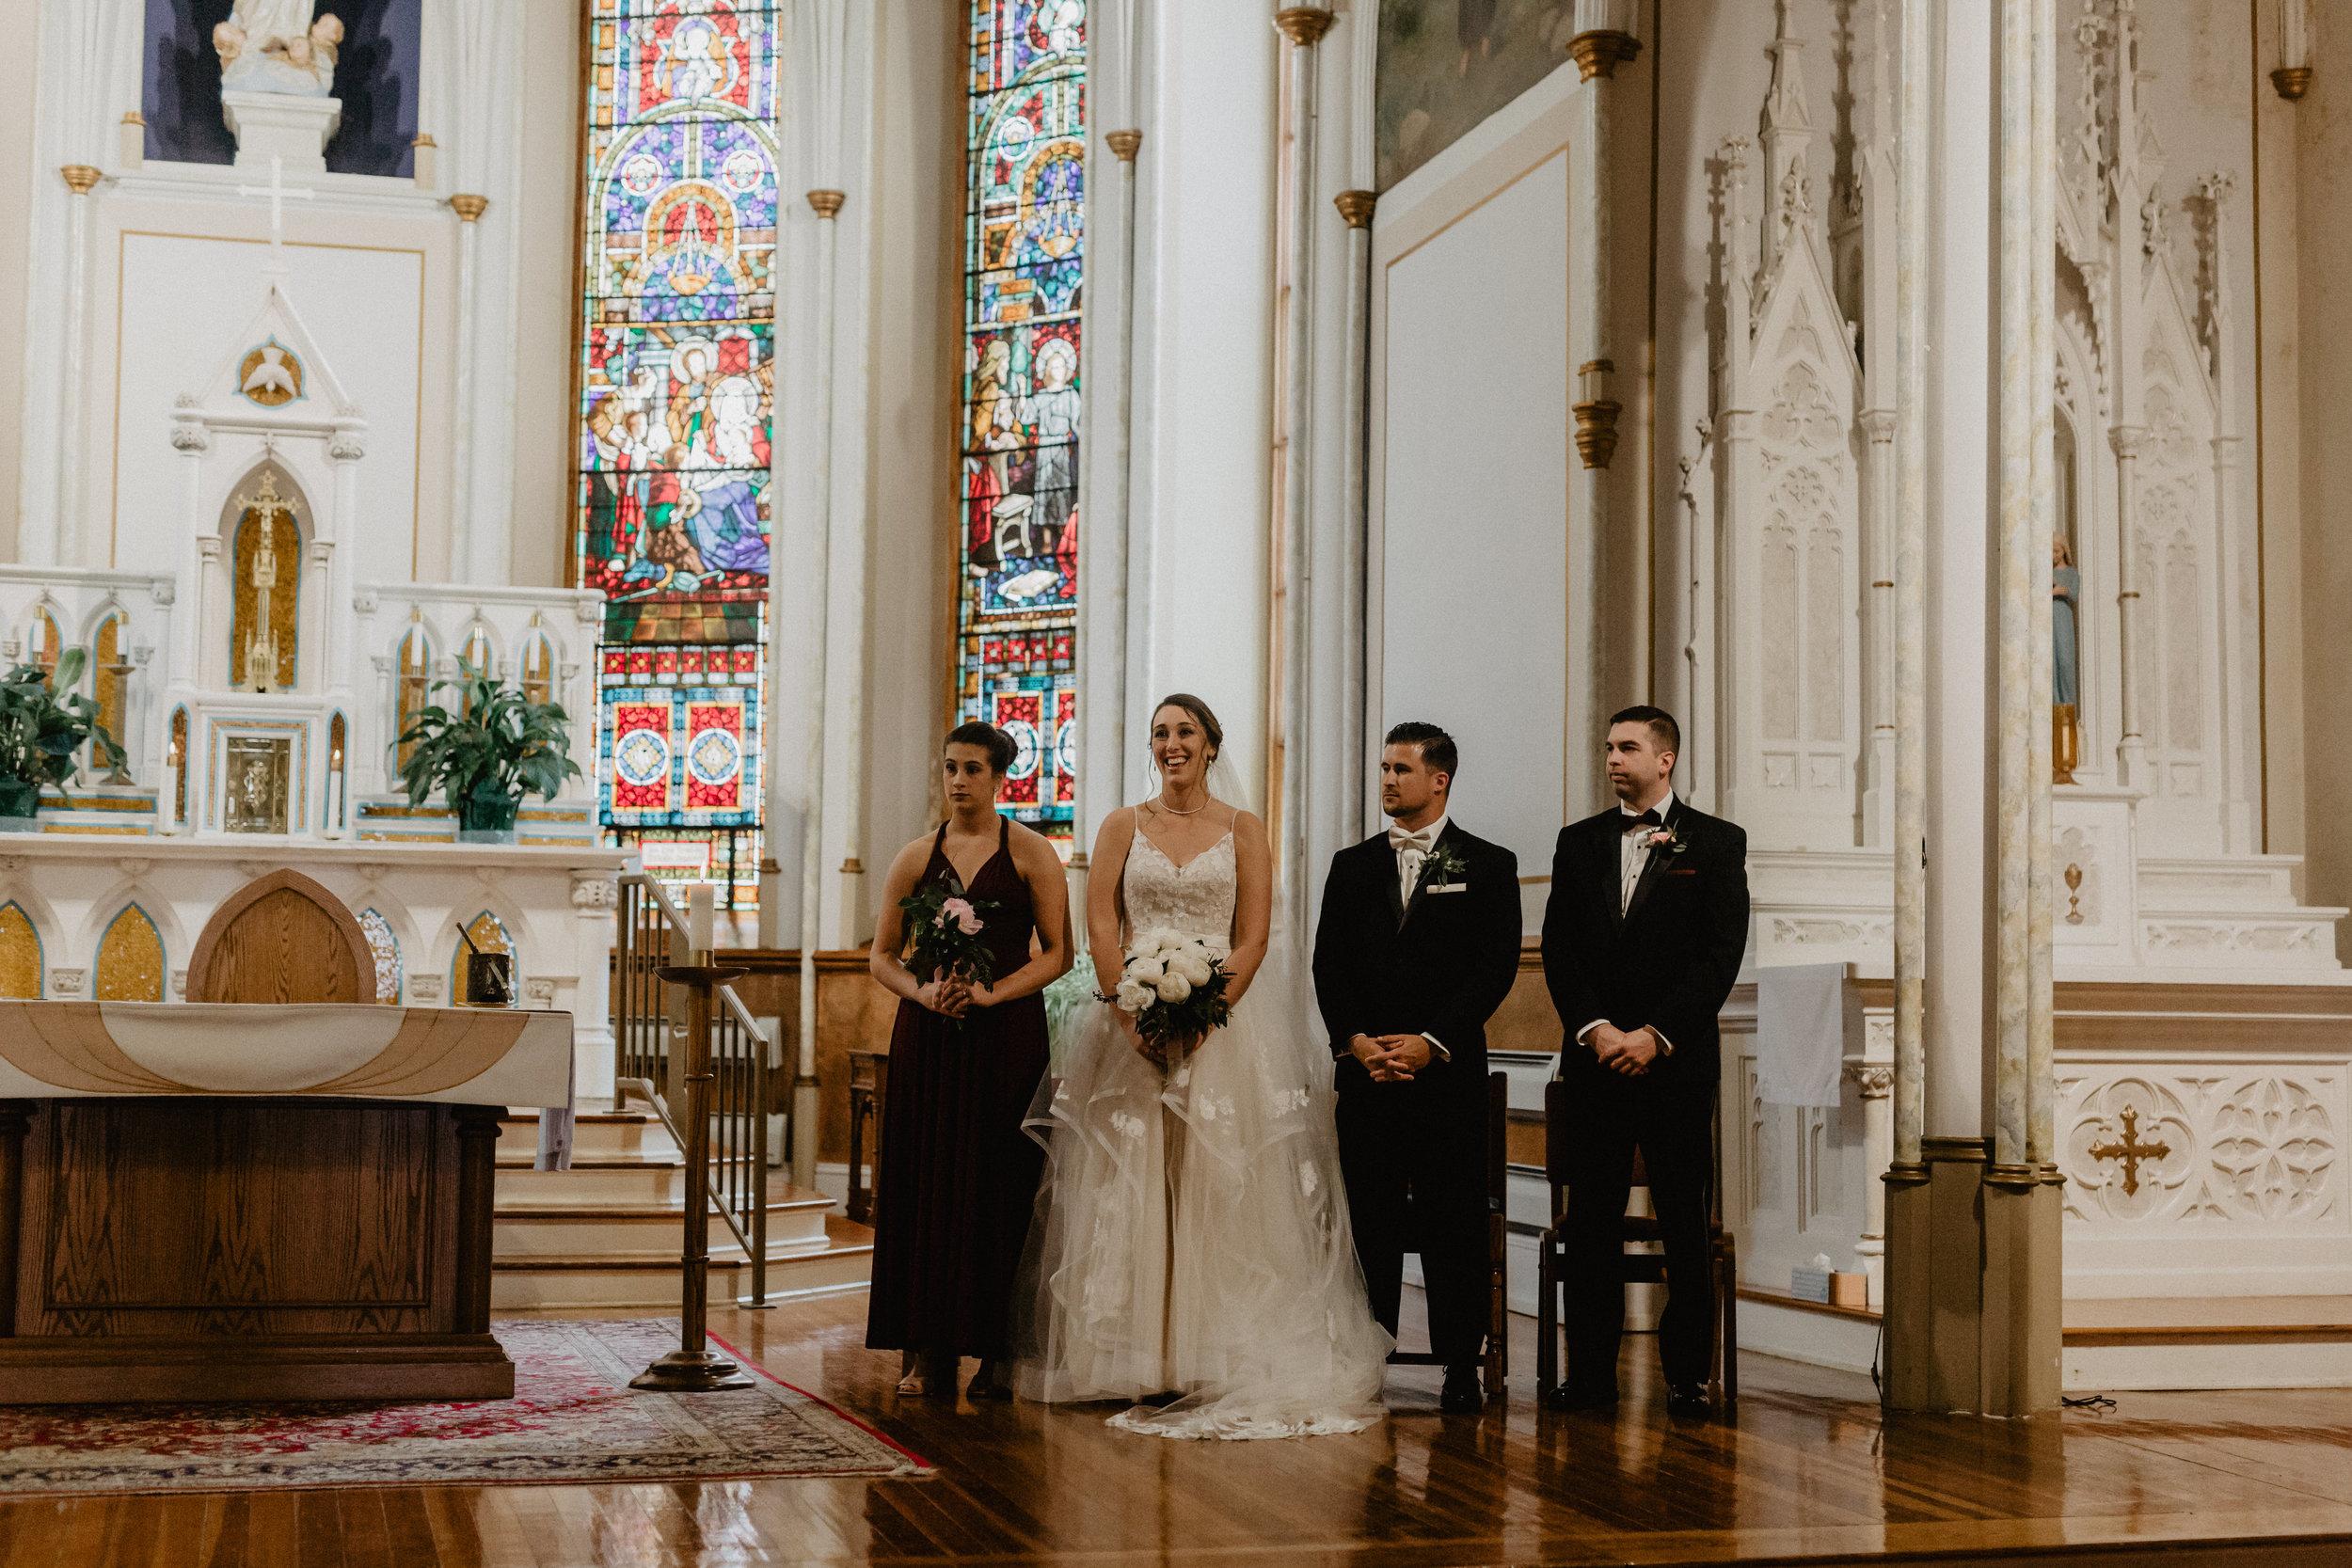 upstate_ny_wedding-25.jpg